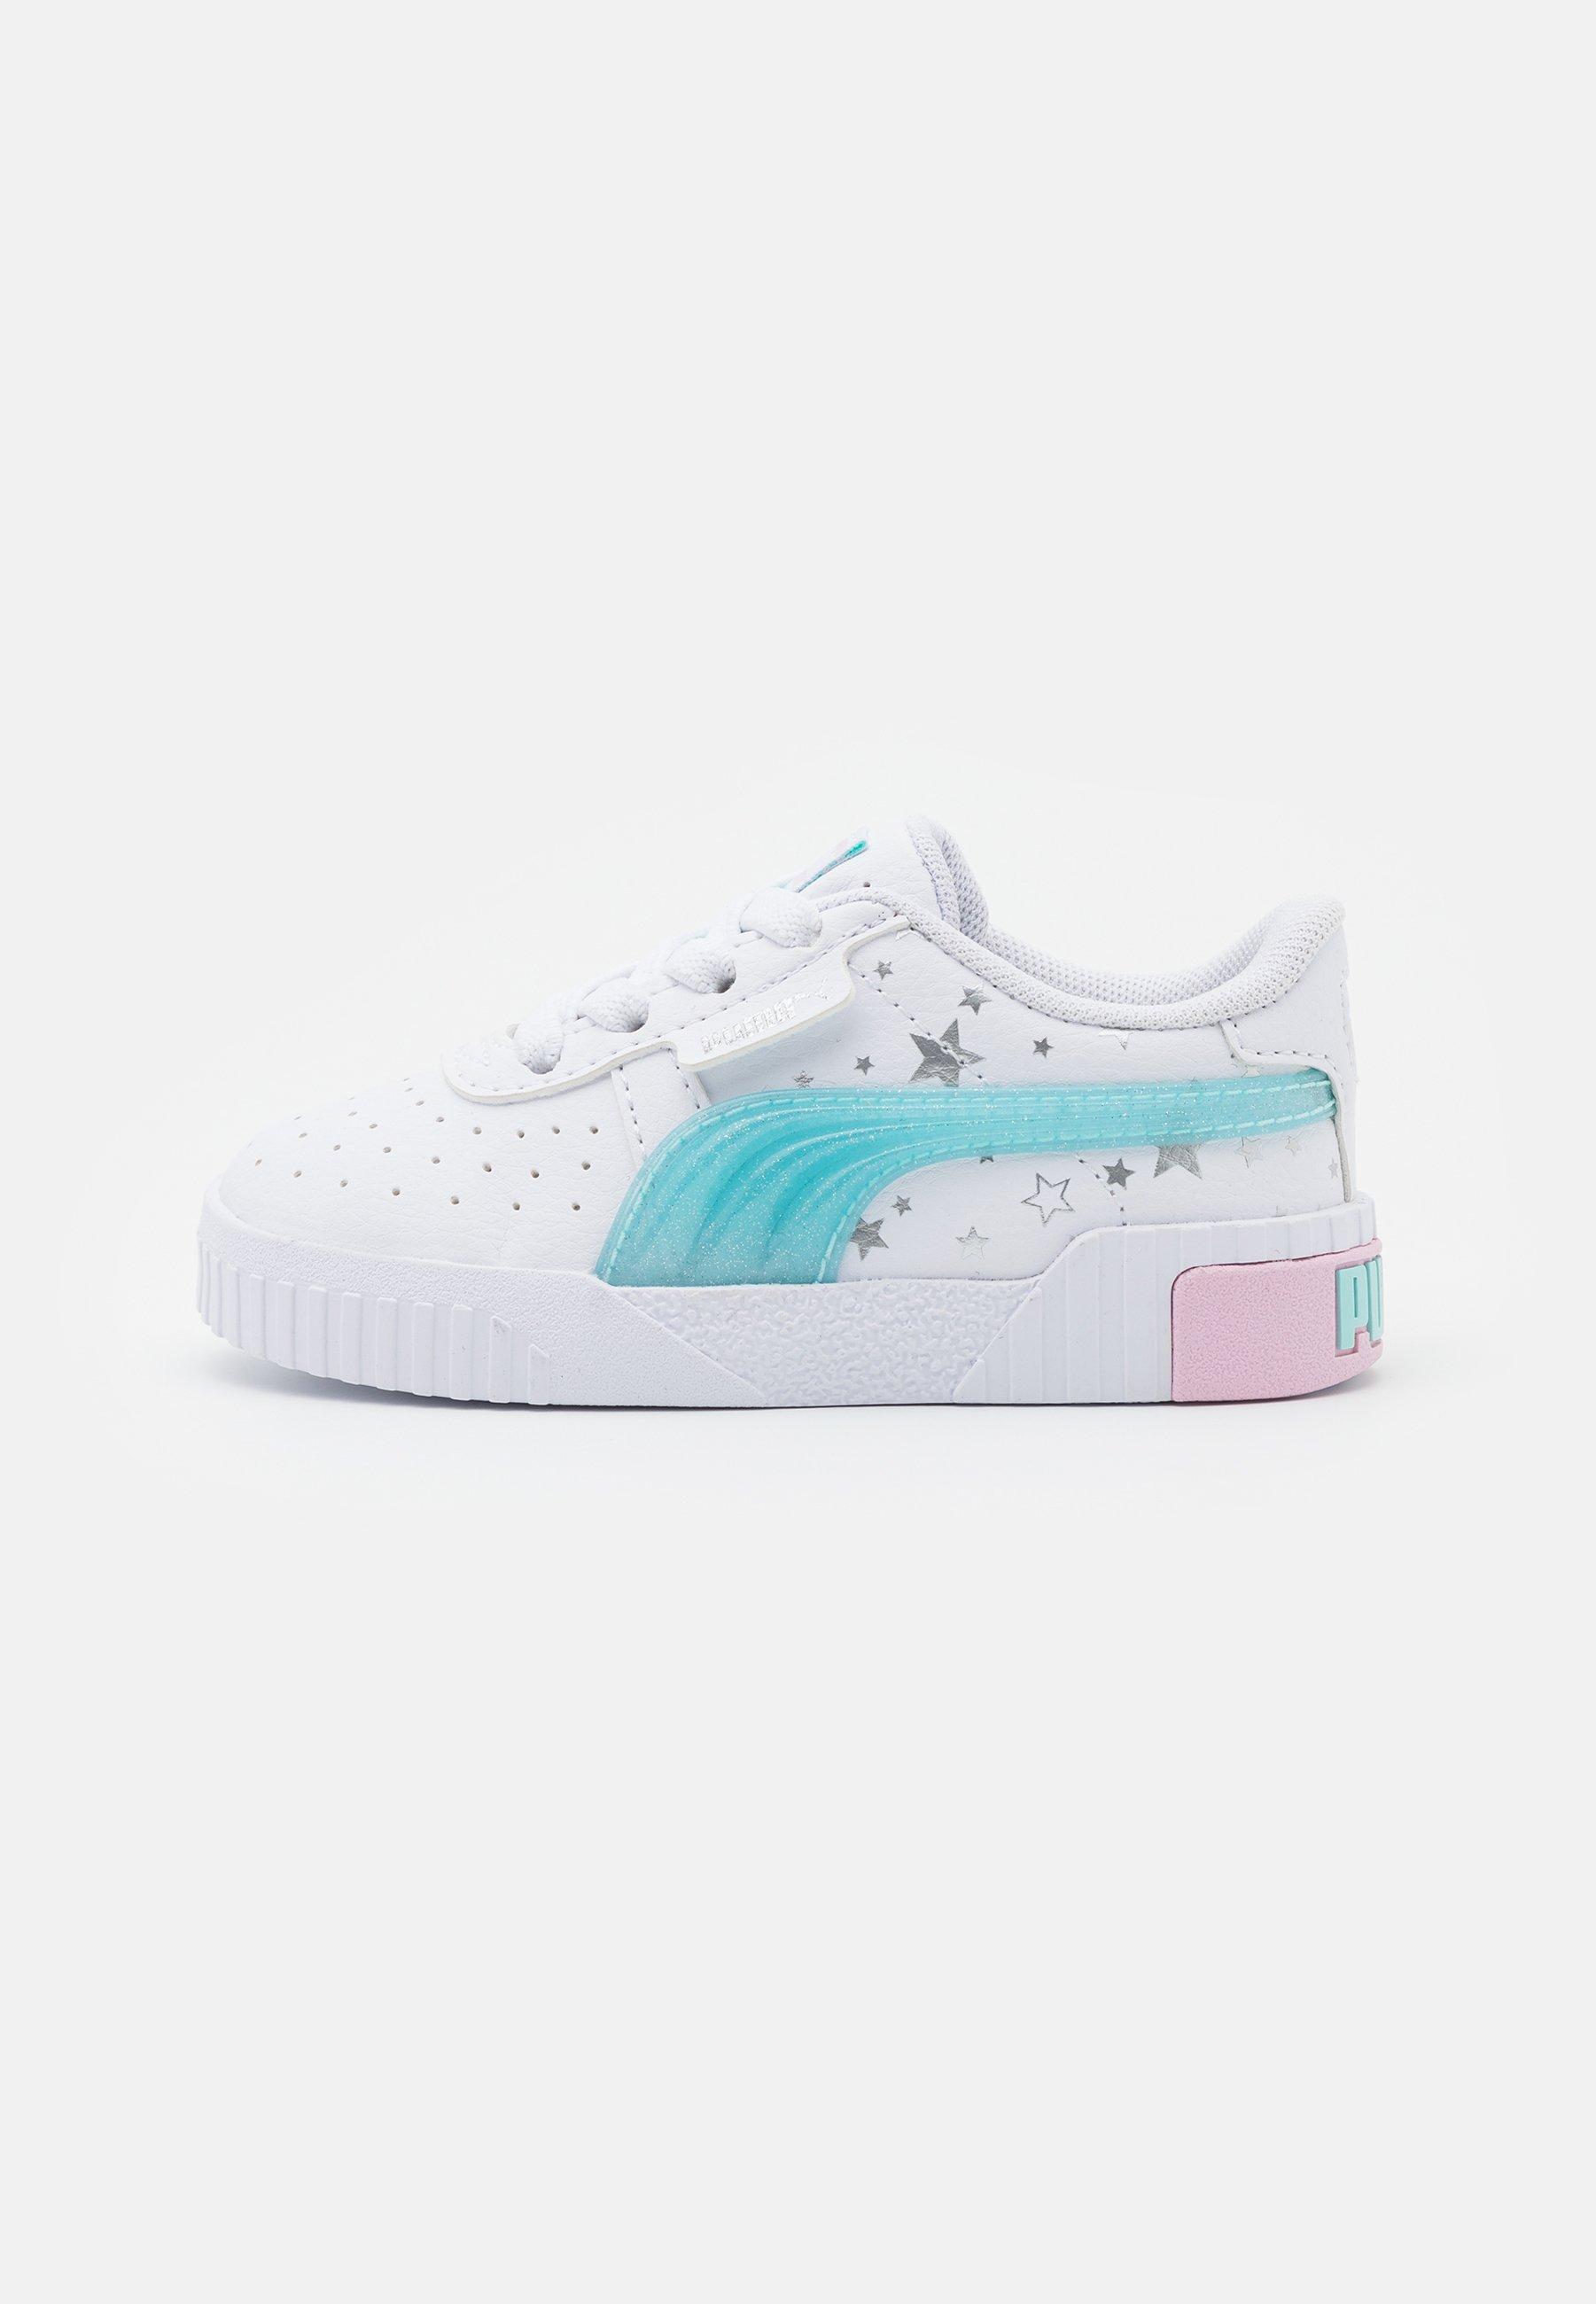 Puma CALI UNICORN - Trainers - pink lady/white/pink - Zalando.ie